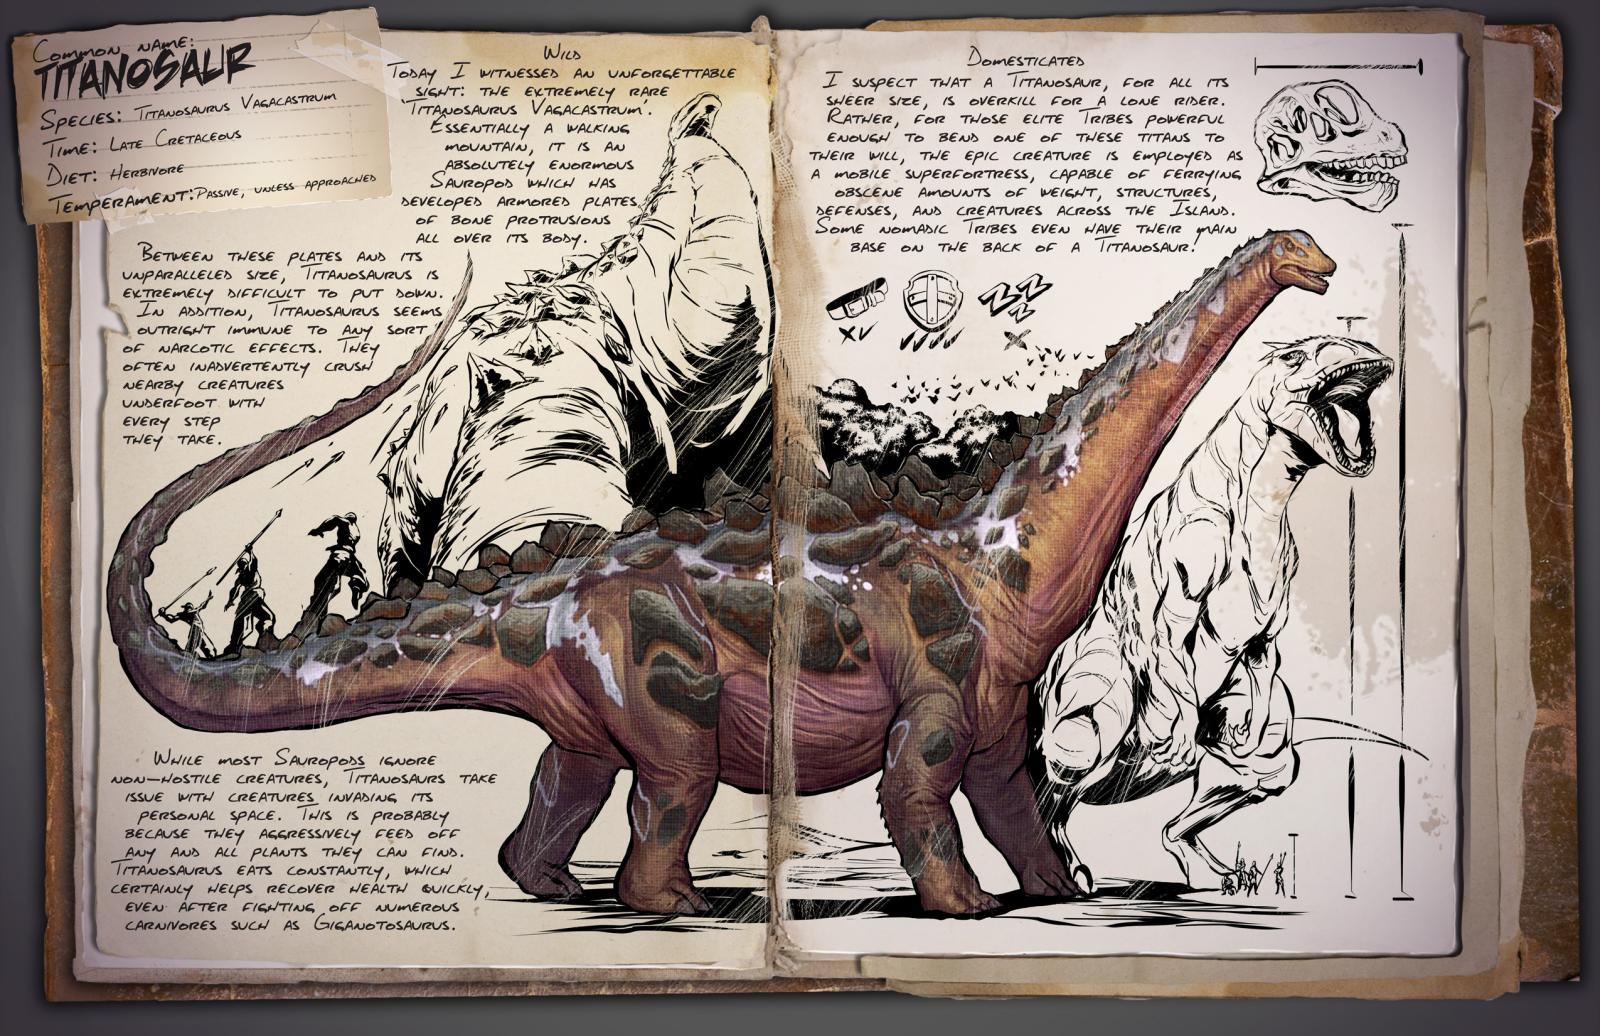 Dossier Titanosaurus.jpg